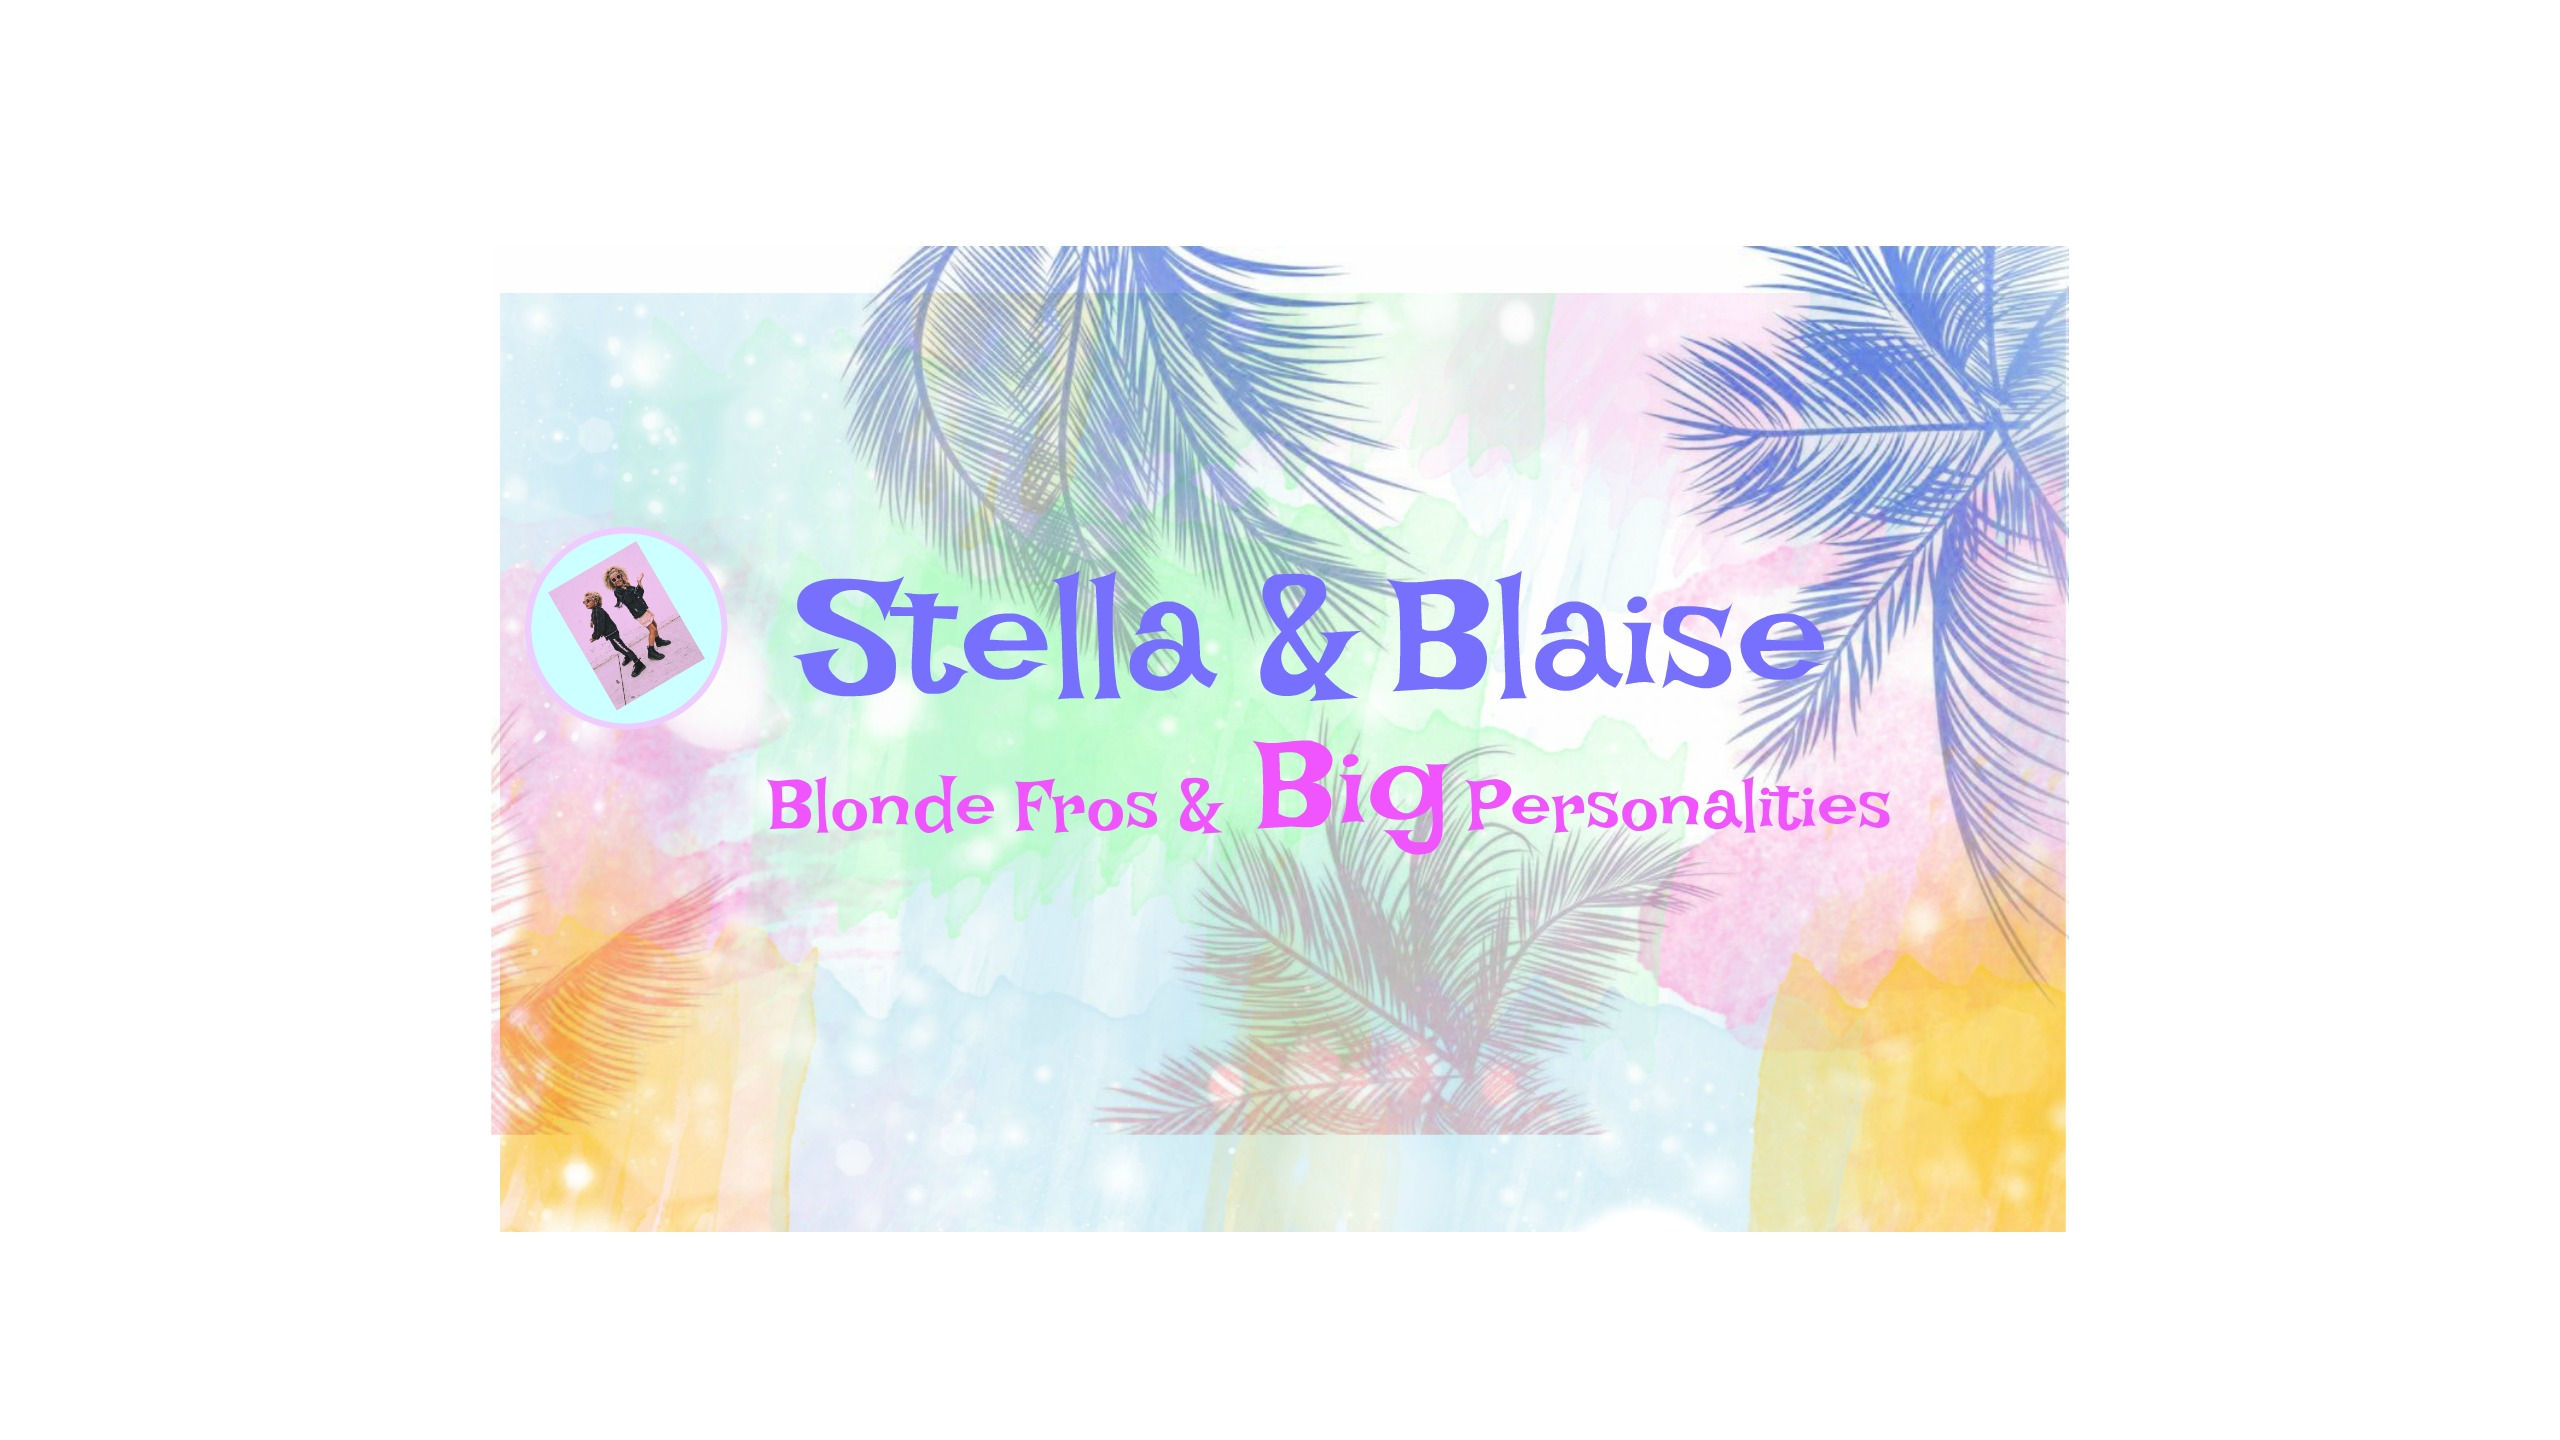 Stella   blaise yt banner